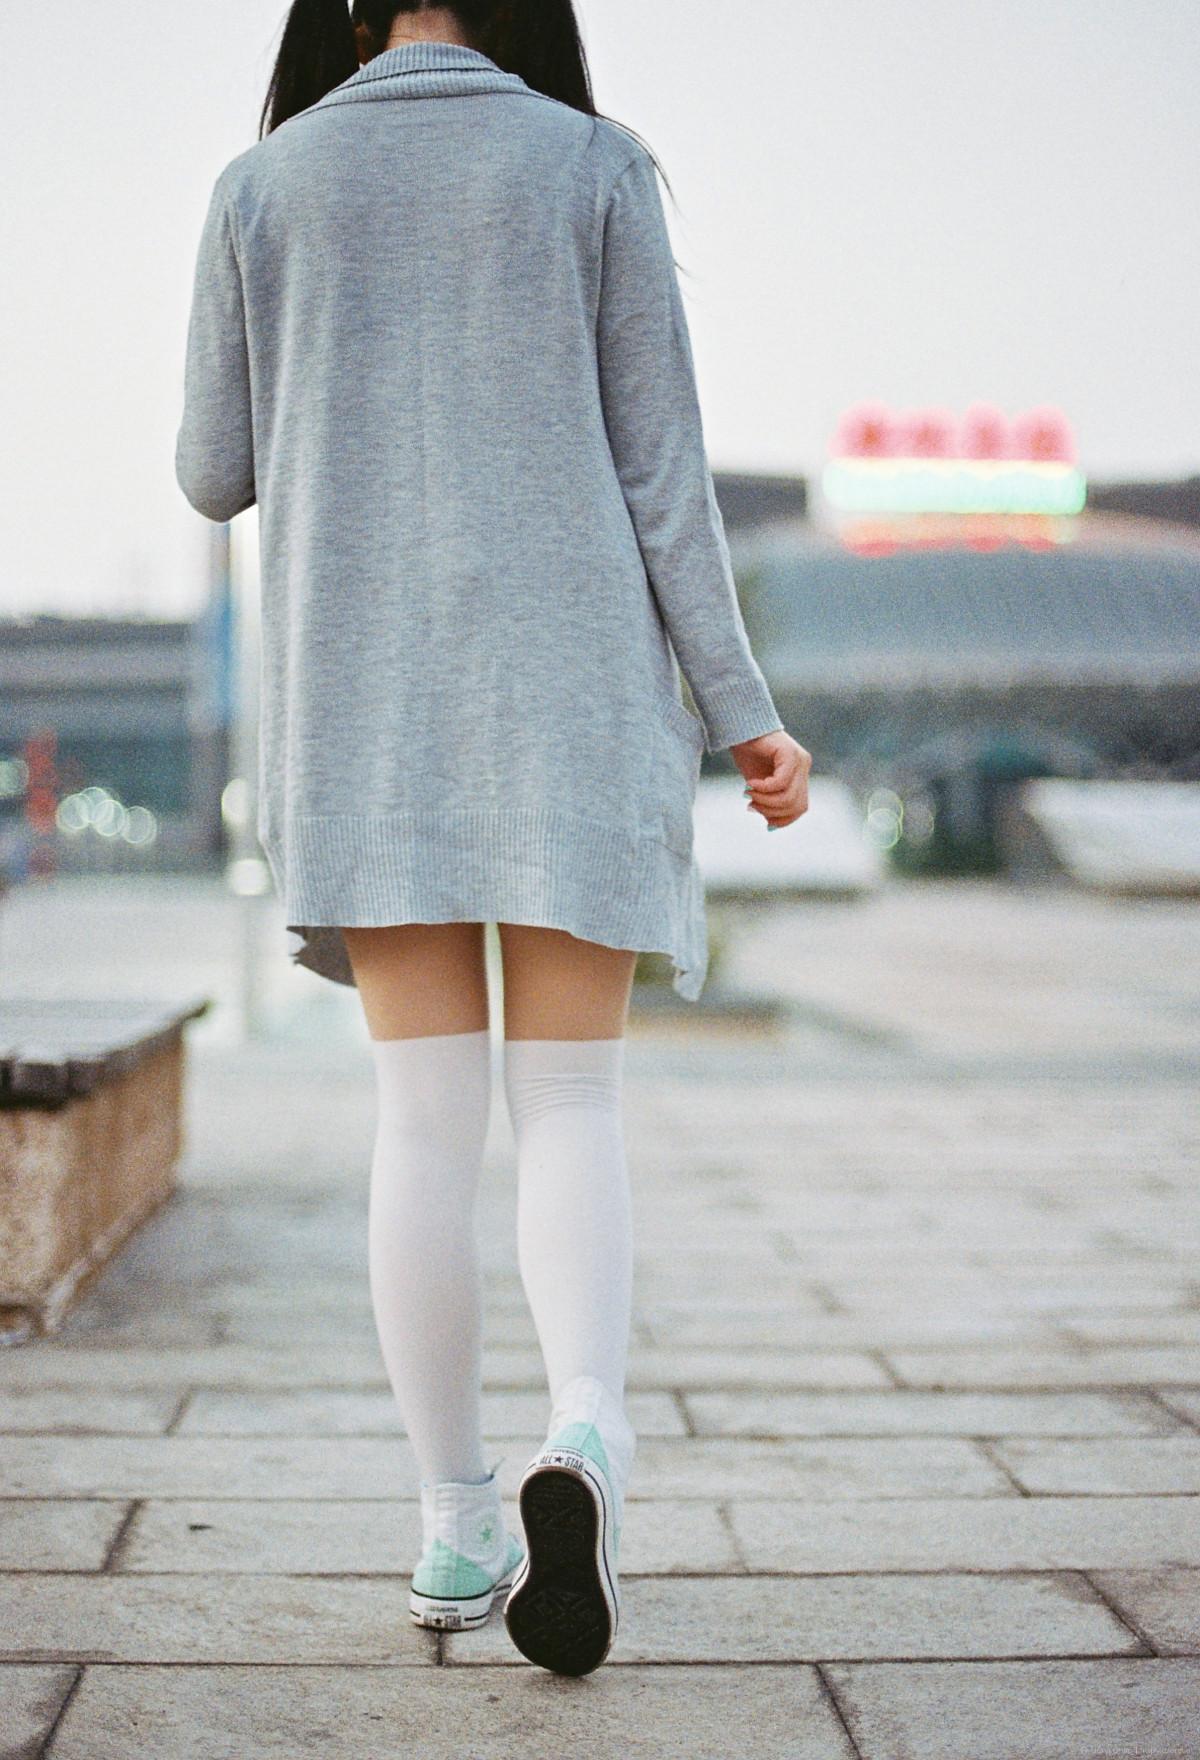 Free Images  Shoe, Girl, White, Cute, Film, Slr, Fujifilm -5730